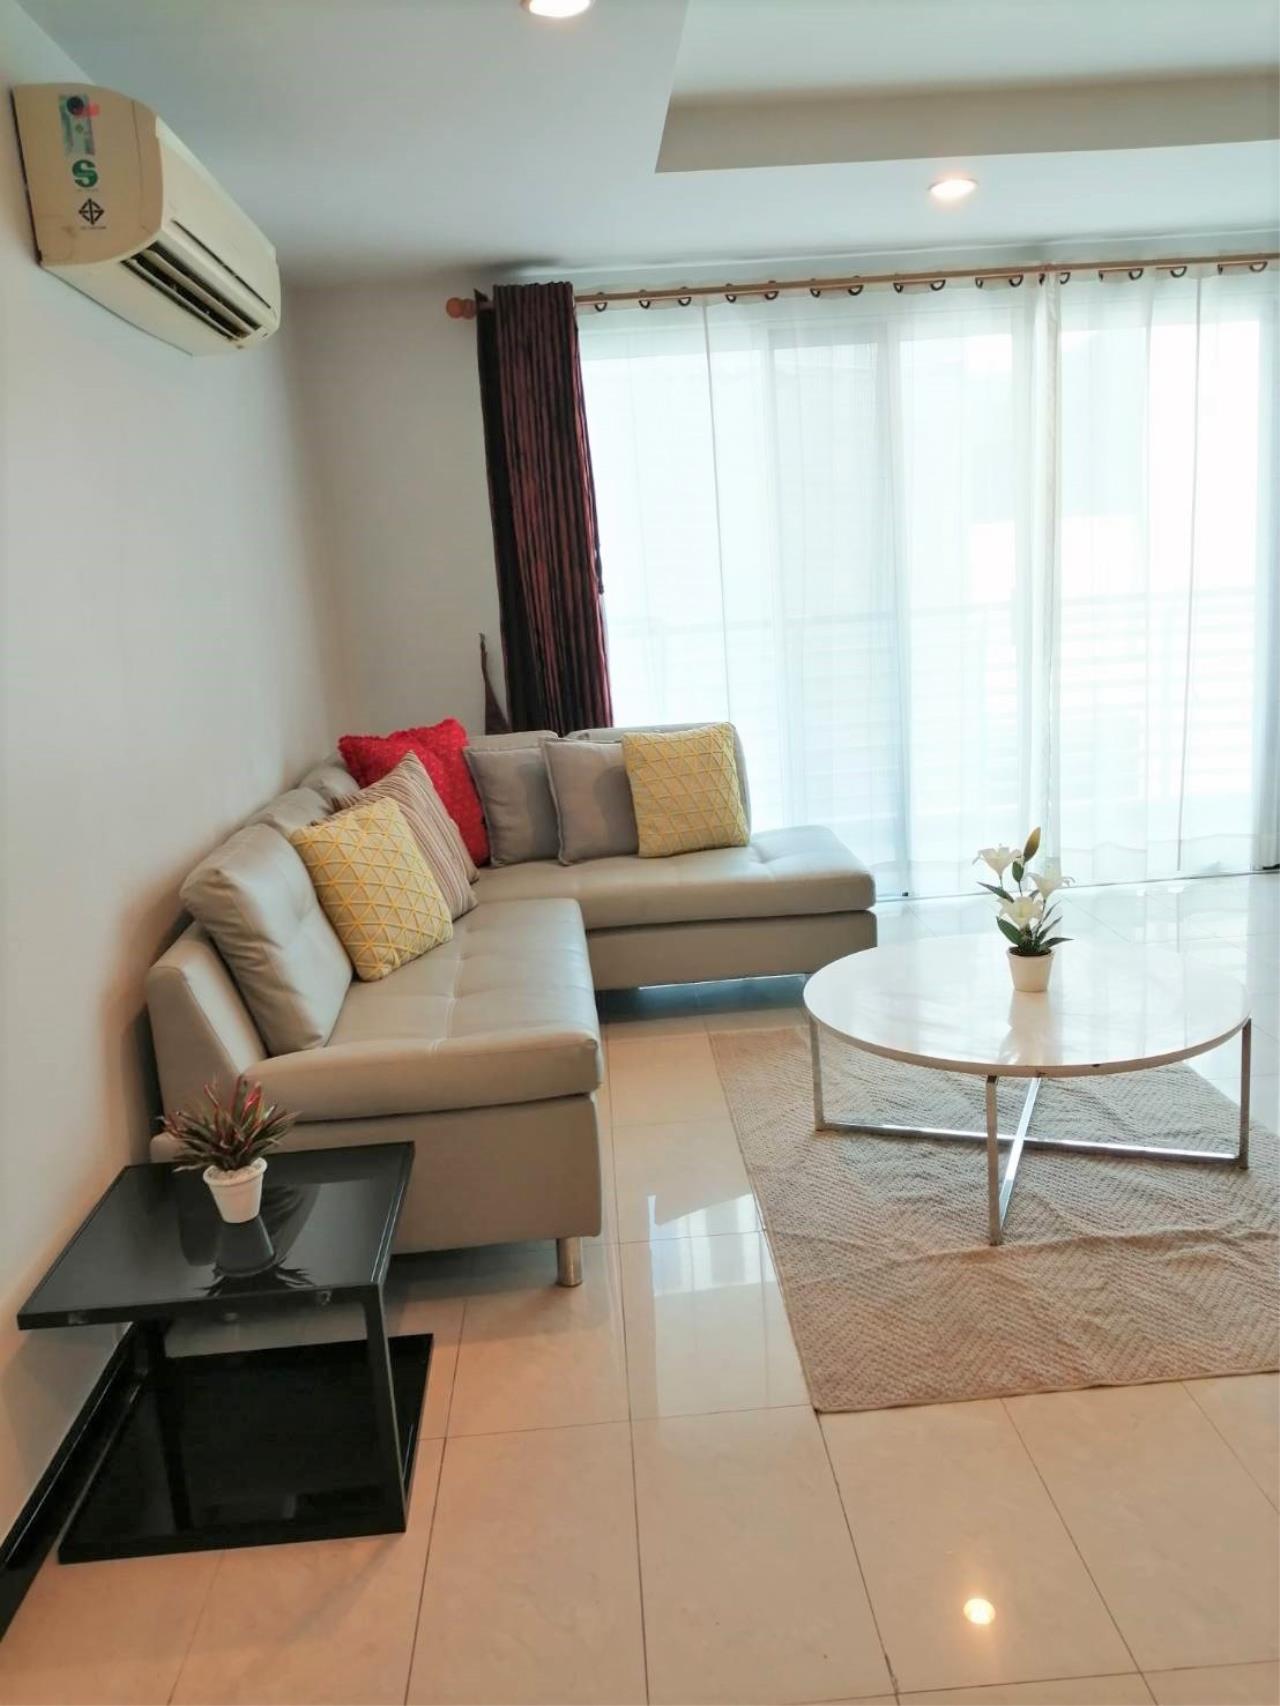 Blueocean property Agency's Condo For Rent – Avenue 61 Condominium 11